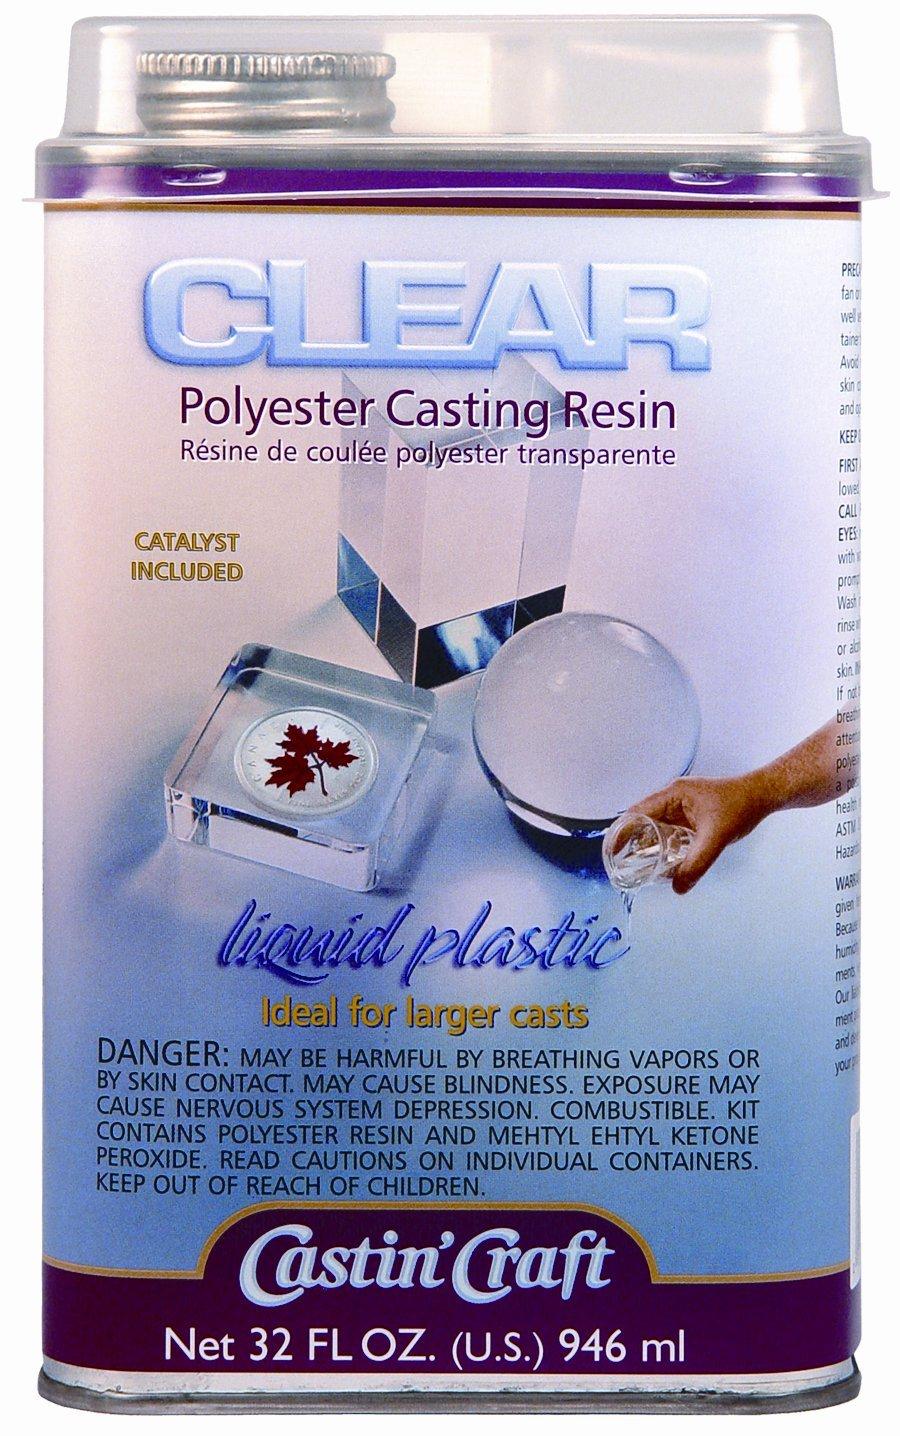 Castin craft color pigment - Crystal Clear Polyester Casting Resin Casting Craft Dyes Pigment Liquid Plastic